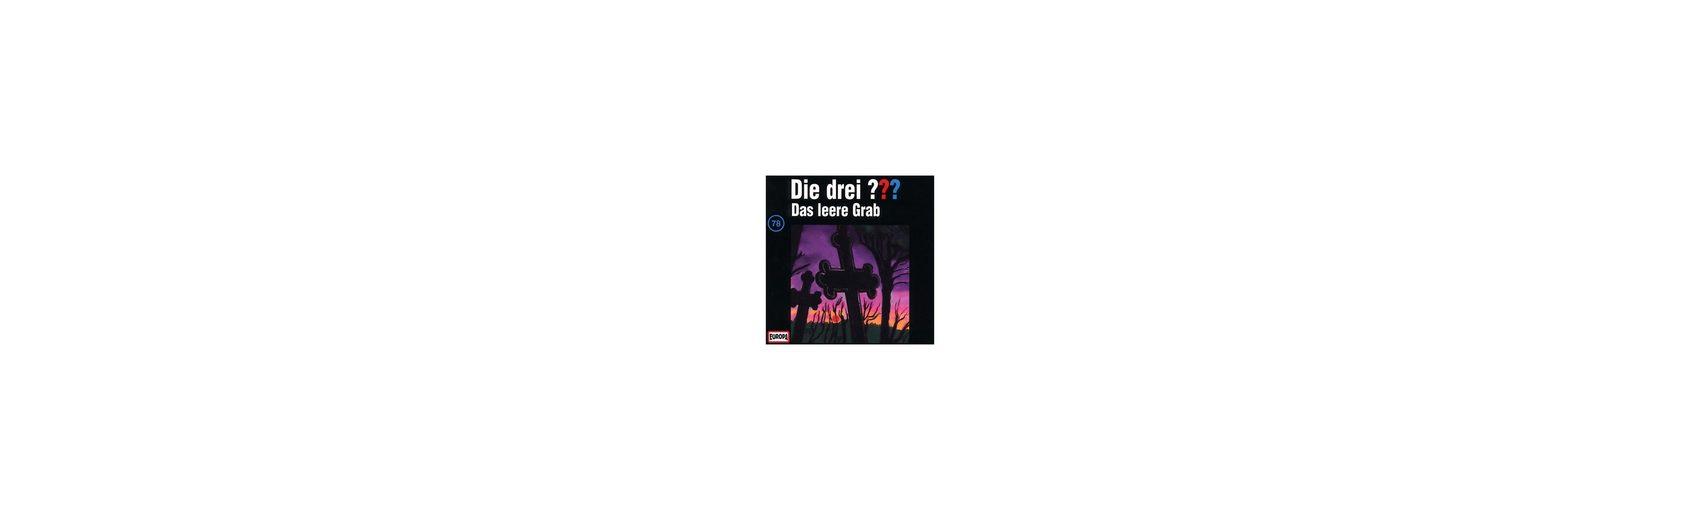 SONY BMG MUSIC CD Drei ??? 78